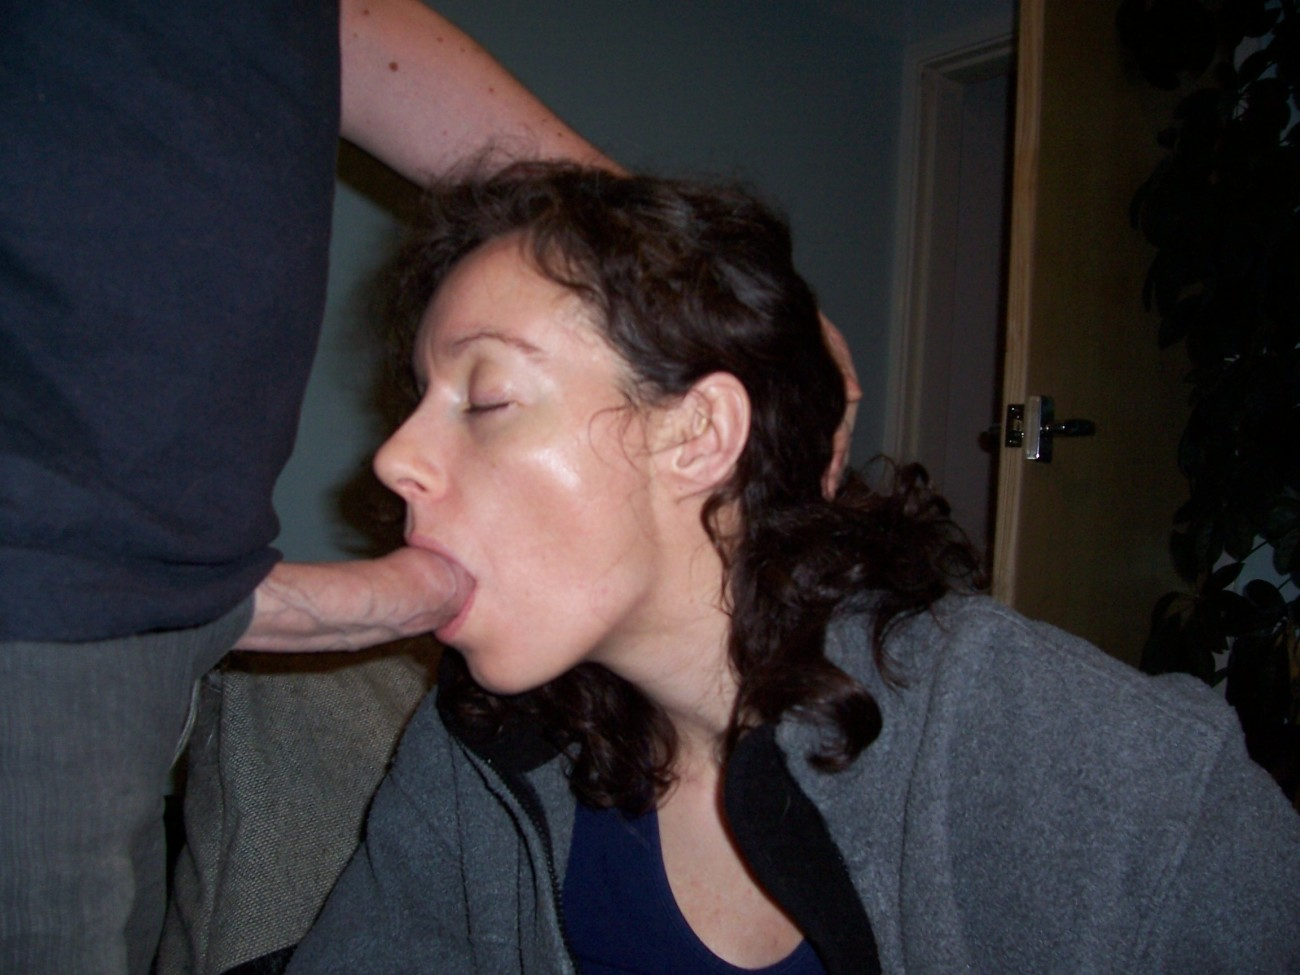 Hot Wife Blowjob Gifs